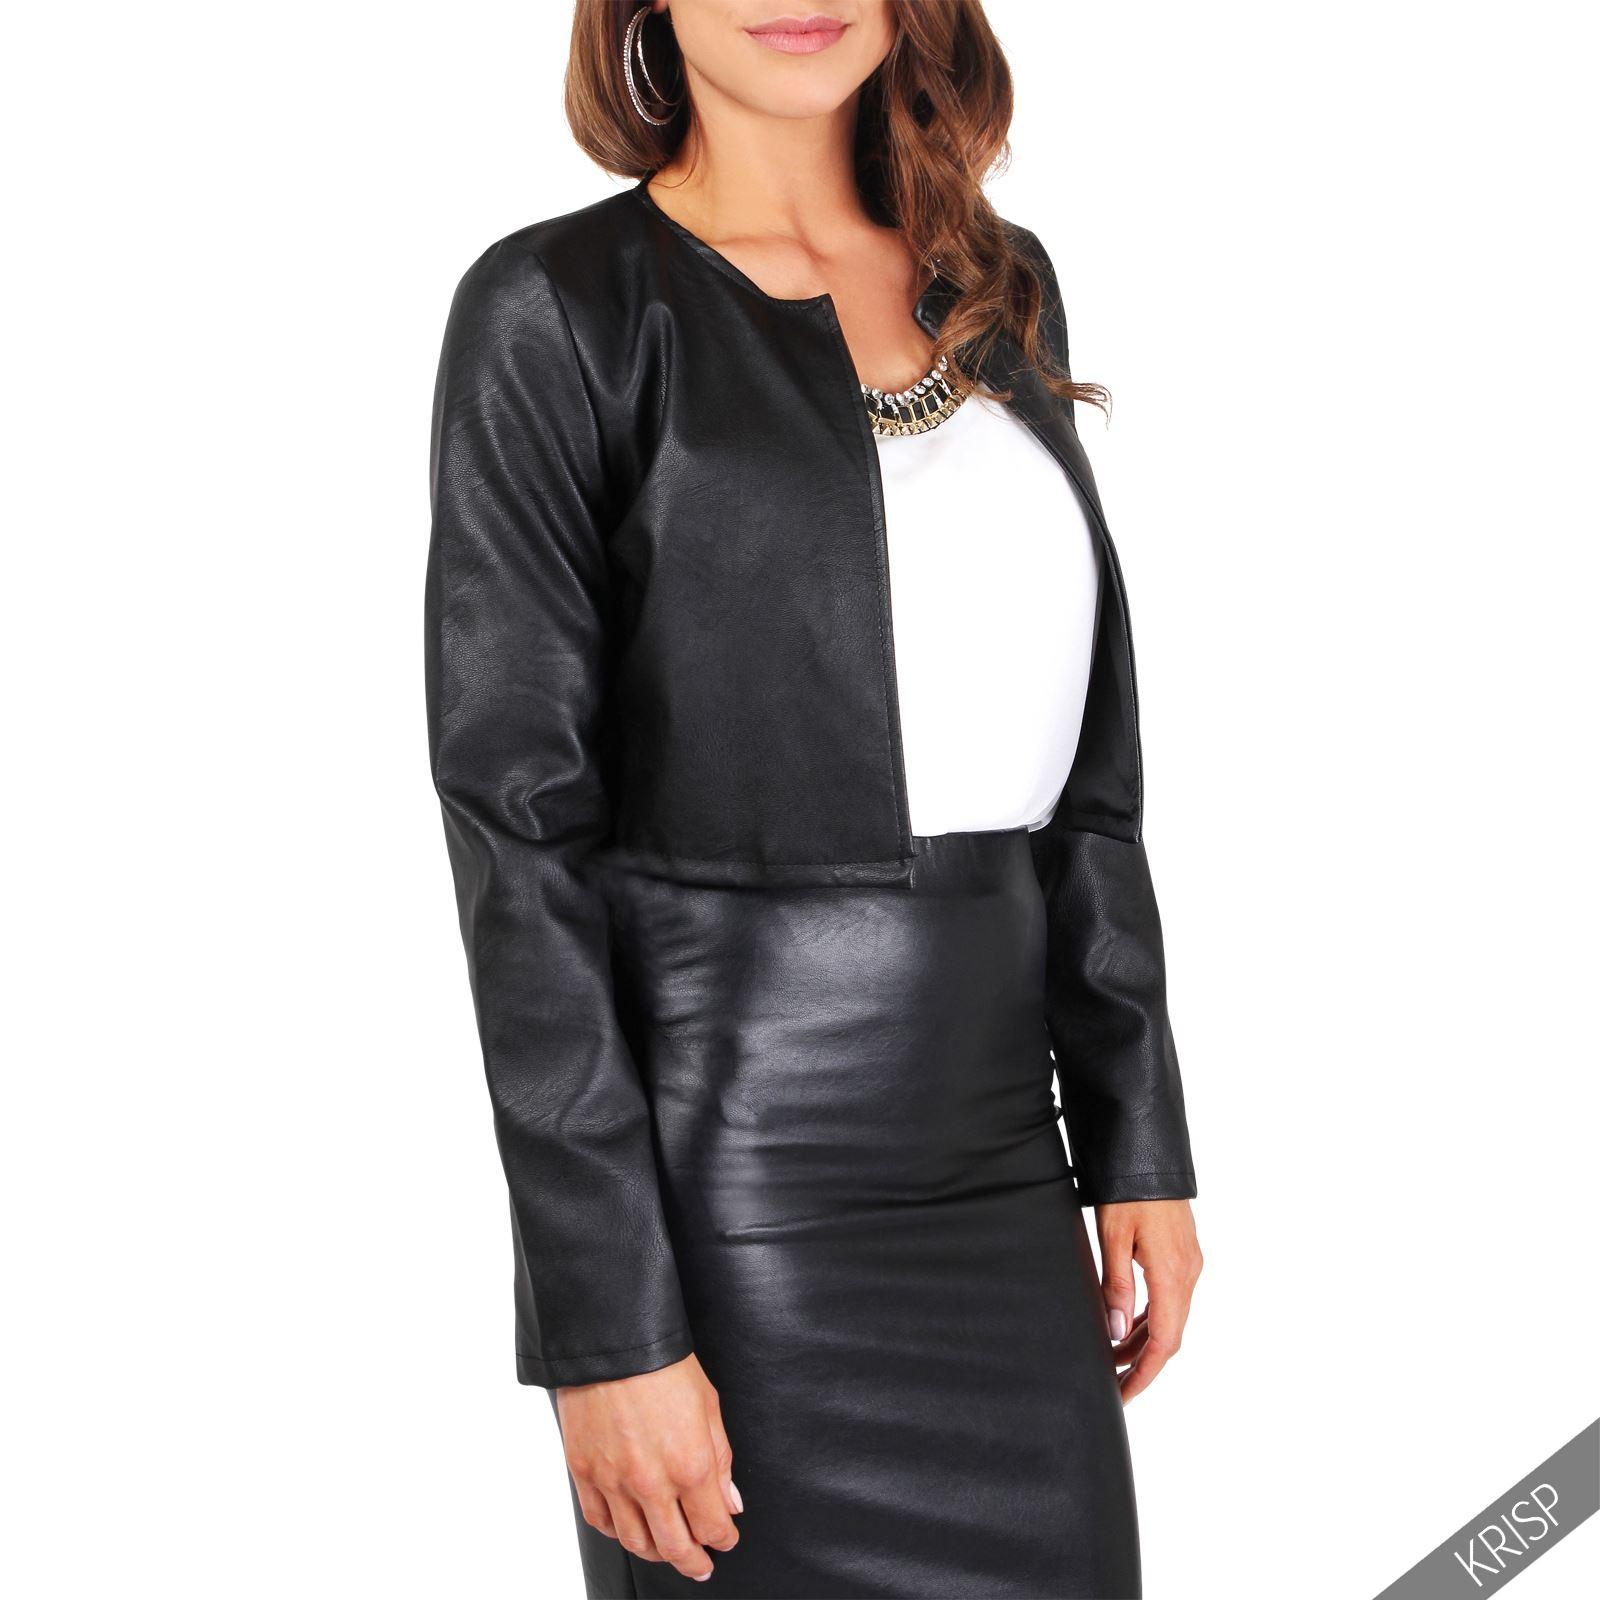 femmes veste blazer bol ro court mini bomber cuir bol ro jacket gilet cardigan ebay. Black Bedroom Furniture Sets. Home Design Ideas